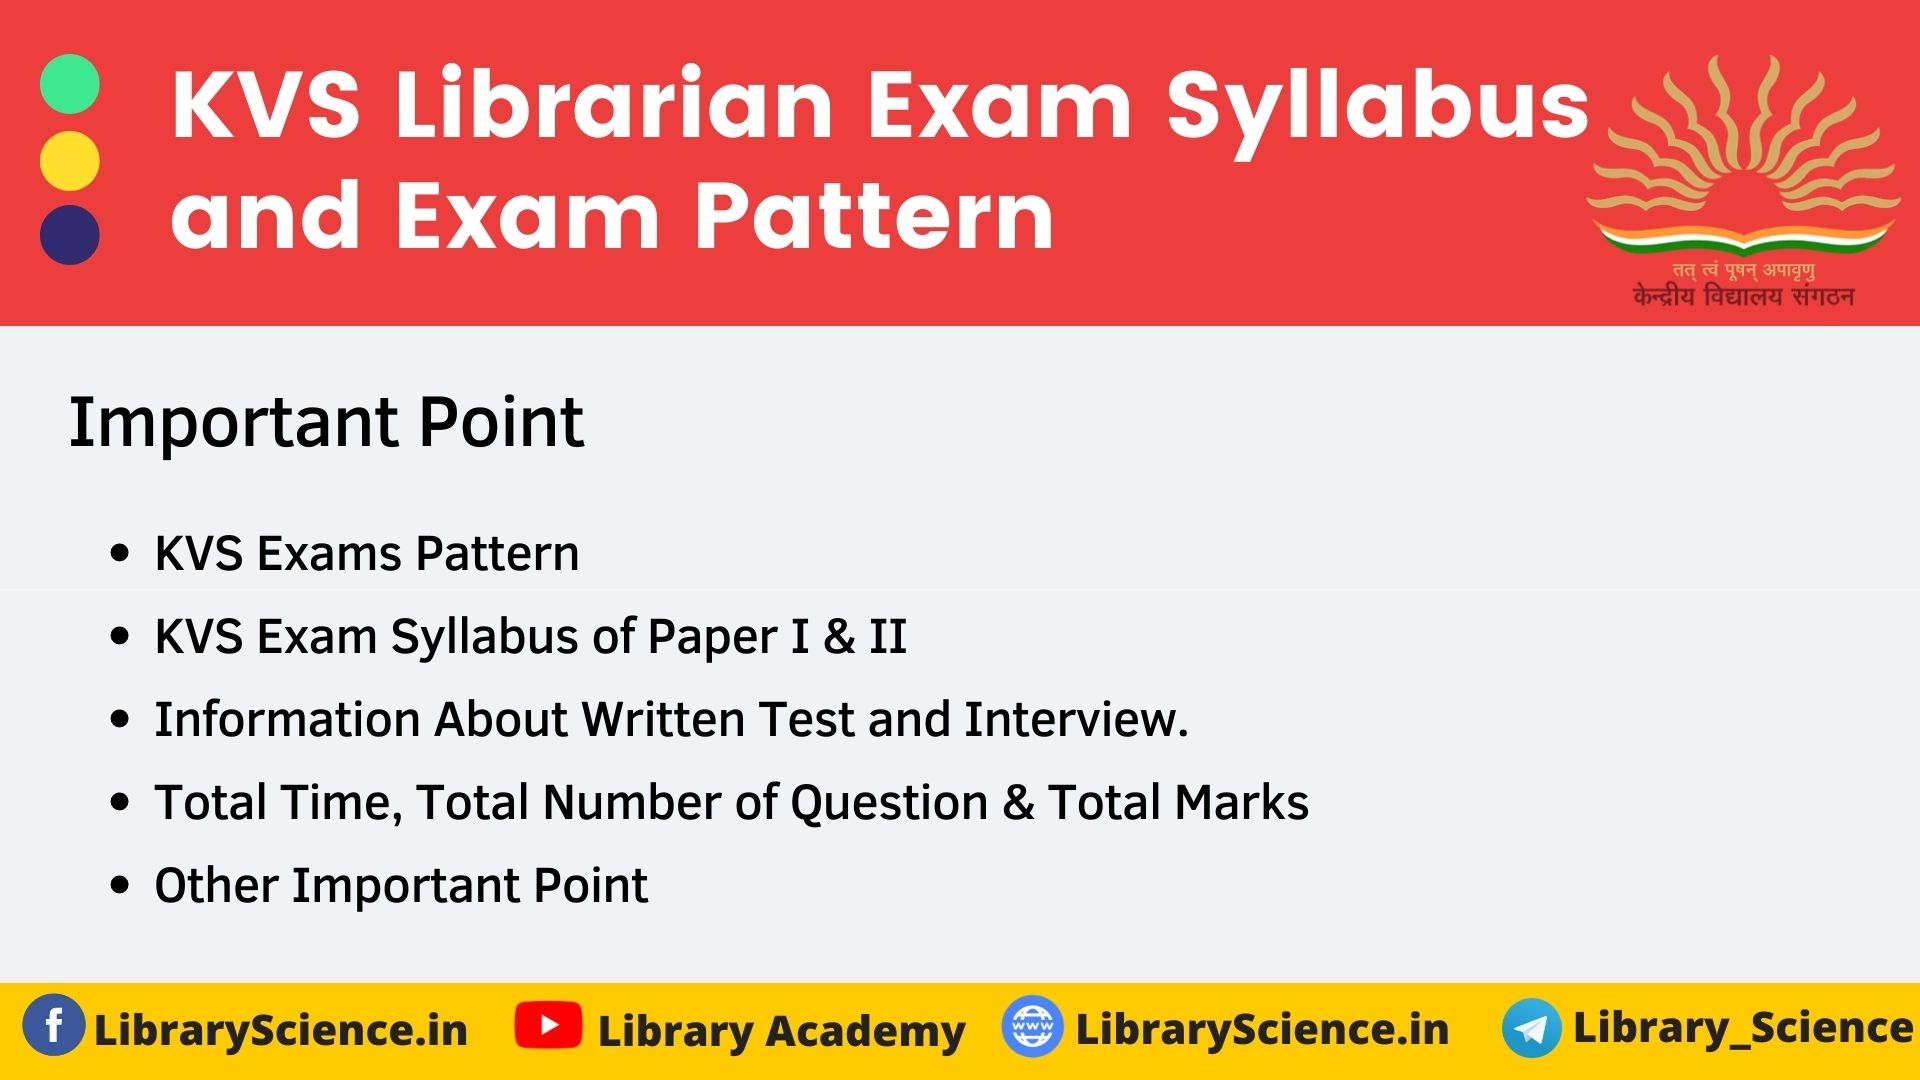 KVS Librarian Exam Syllabus